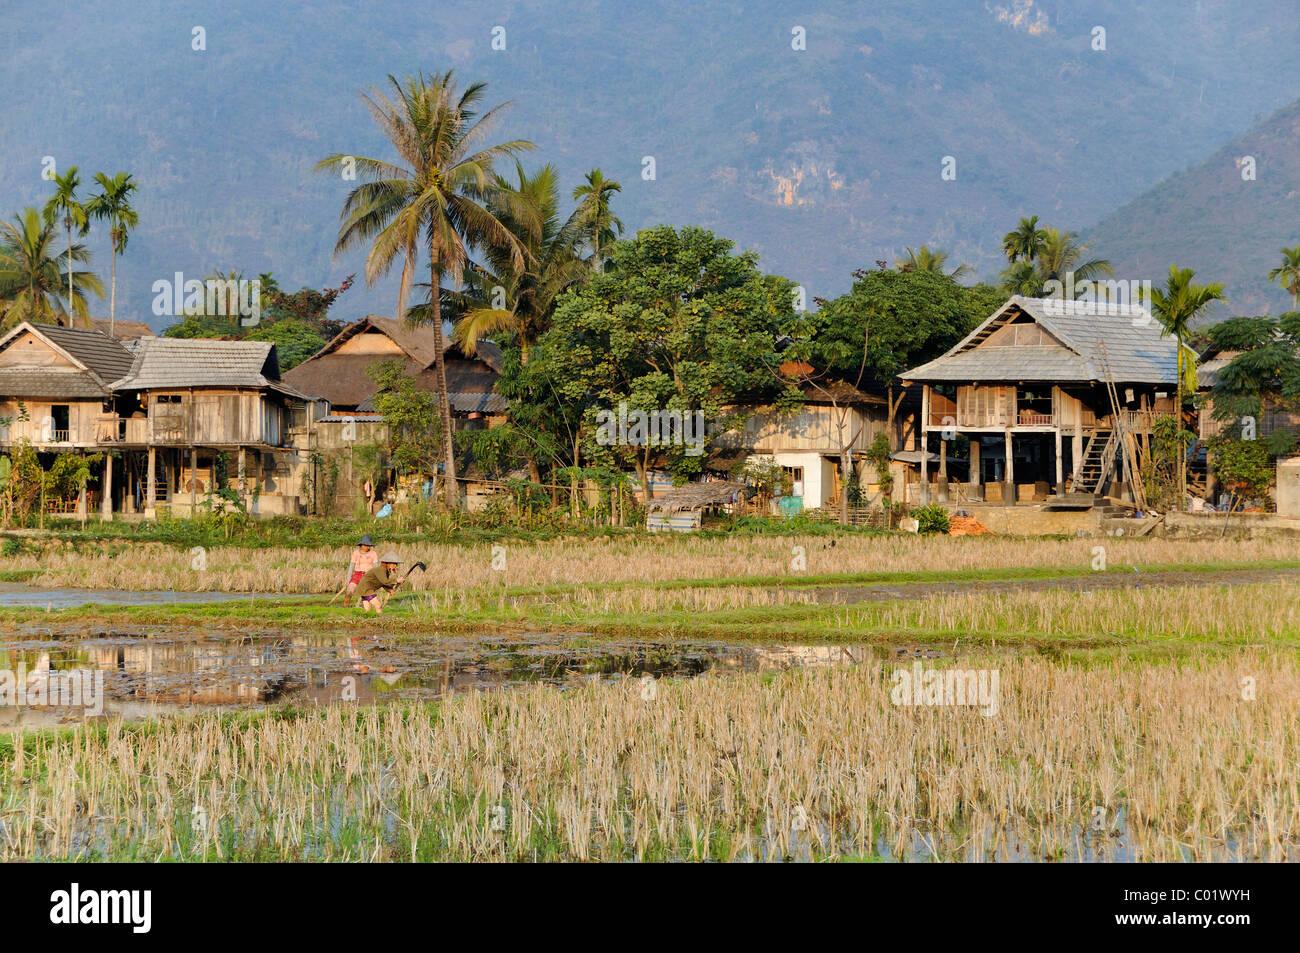 Mai Chau, una aldea donde viven minorías étnicas, Vietnam, Sudeste de Asia Imagen De Stock